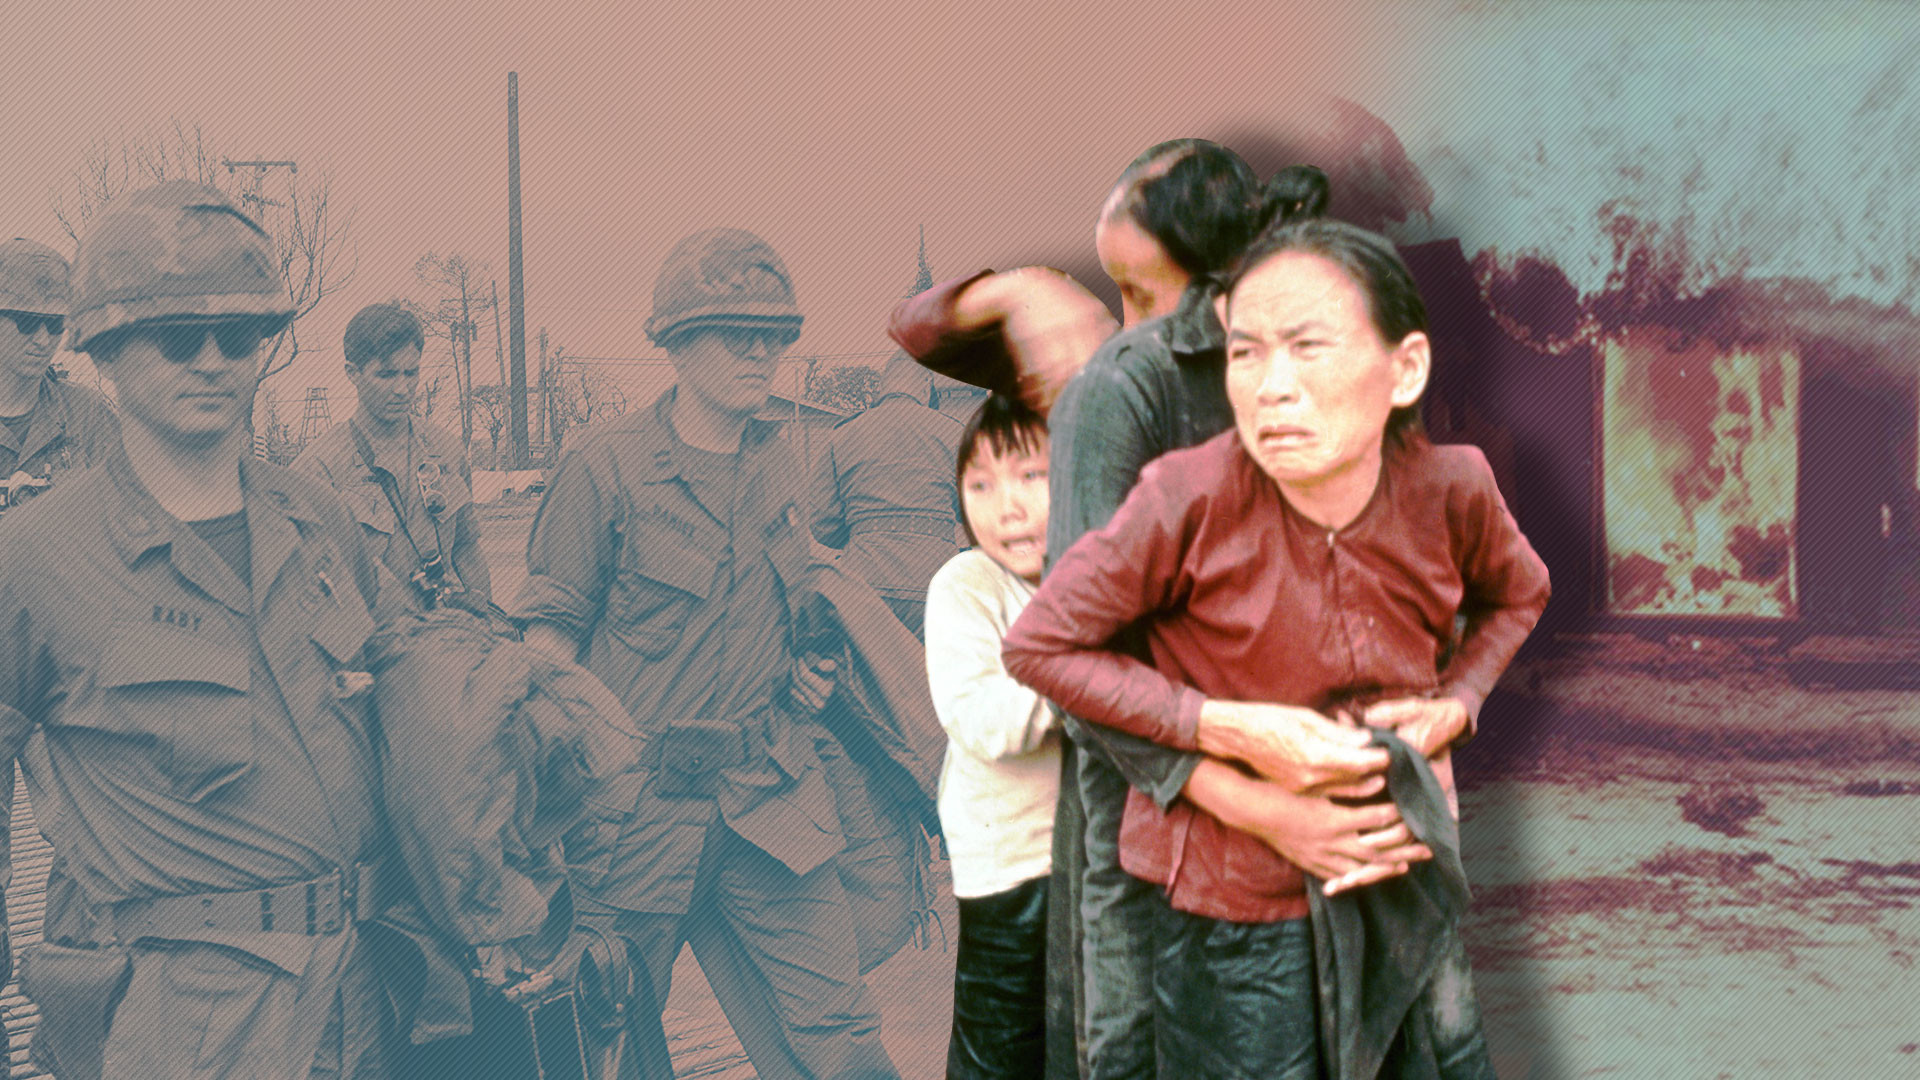 "<p>Коллаж. Фото: © <a href=""https://en.wikipedia.org/wiki/My_Lai_Massacre"" target=""_self"">Ronald L. Haeberle</a>, AP Photo</p>"